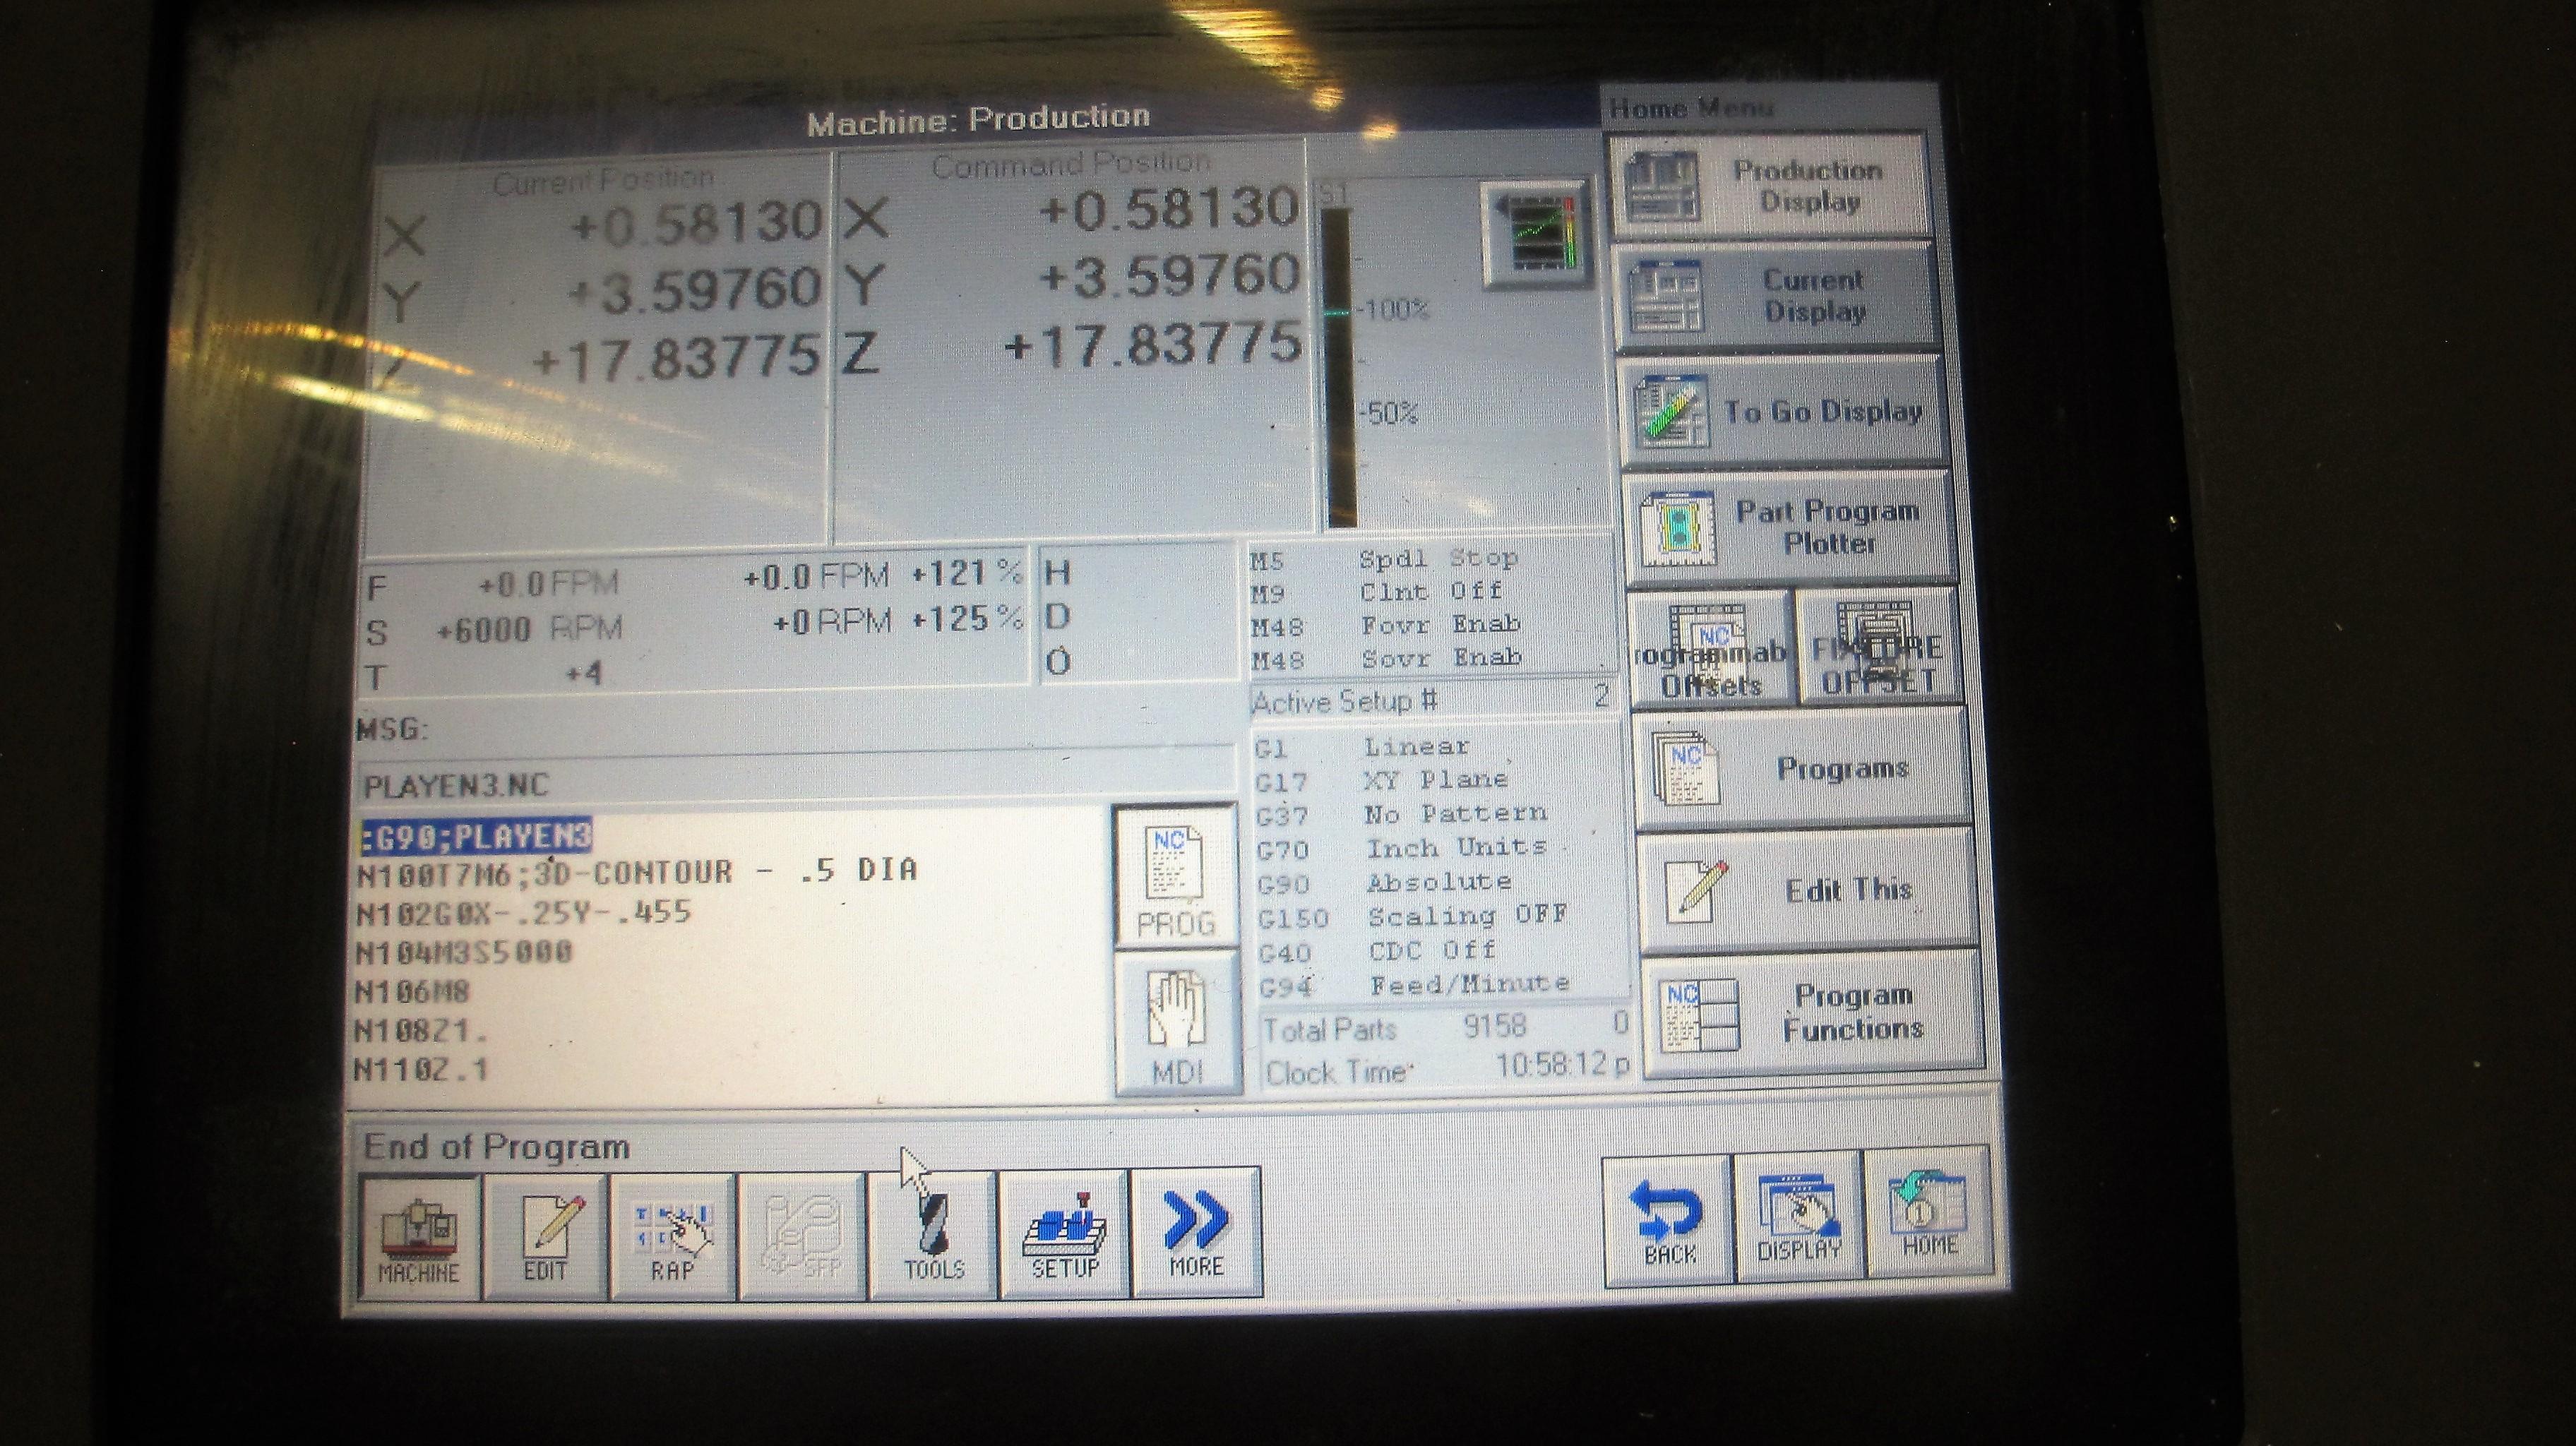 "TREEVMC 800/20 CNC VERTICAL MACHINING CENTER, S/N TS80900014U, PC-2100 CNC CONTROL, ATC, 25"" x - Image 4 of 16"